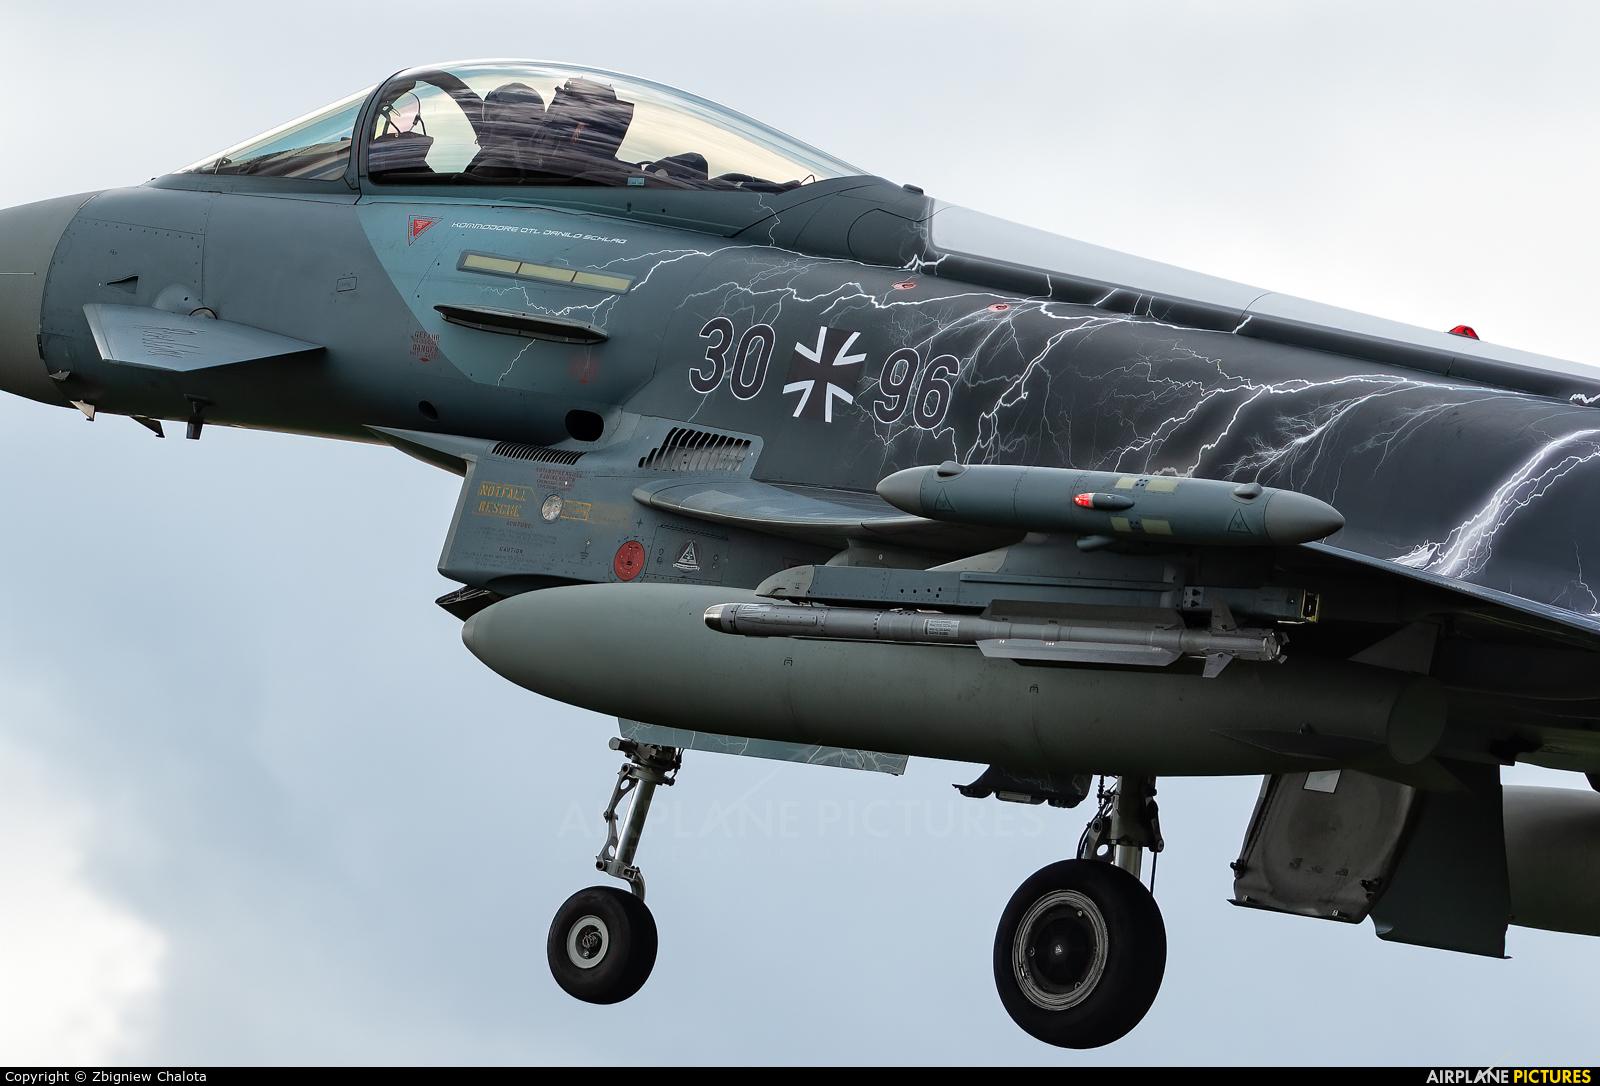 Germany - Air Force 30+96 aircraft at Nörvenich